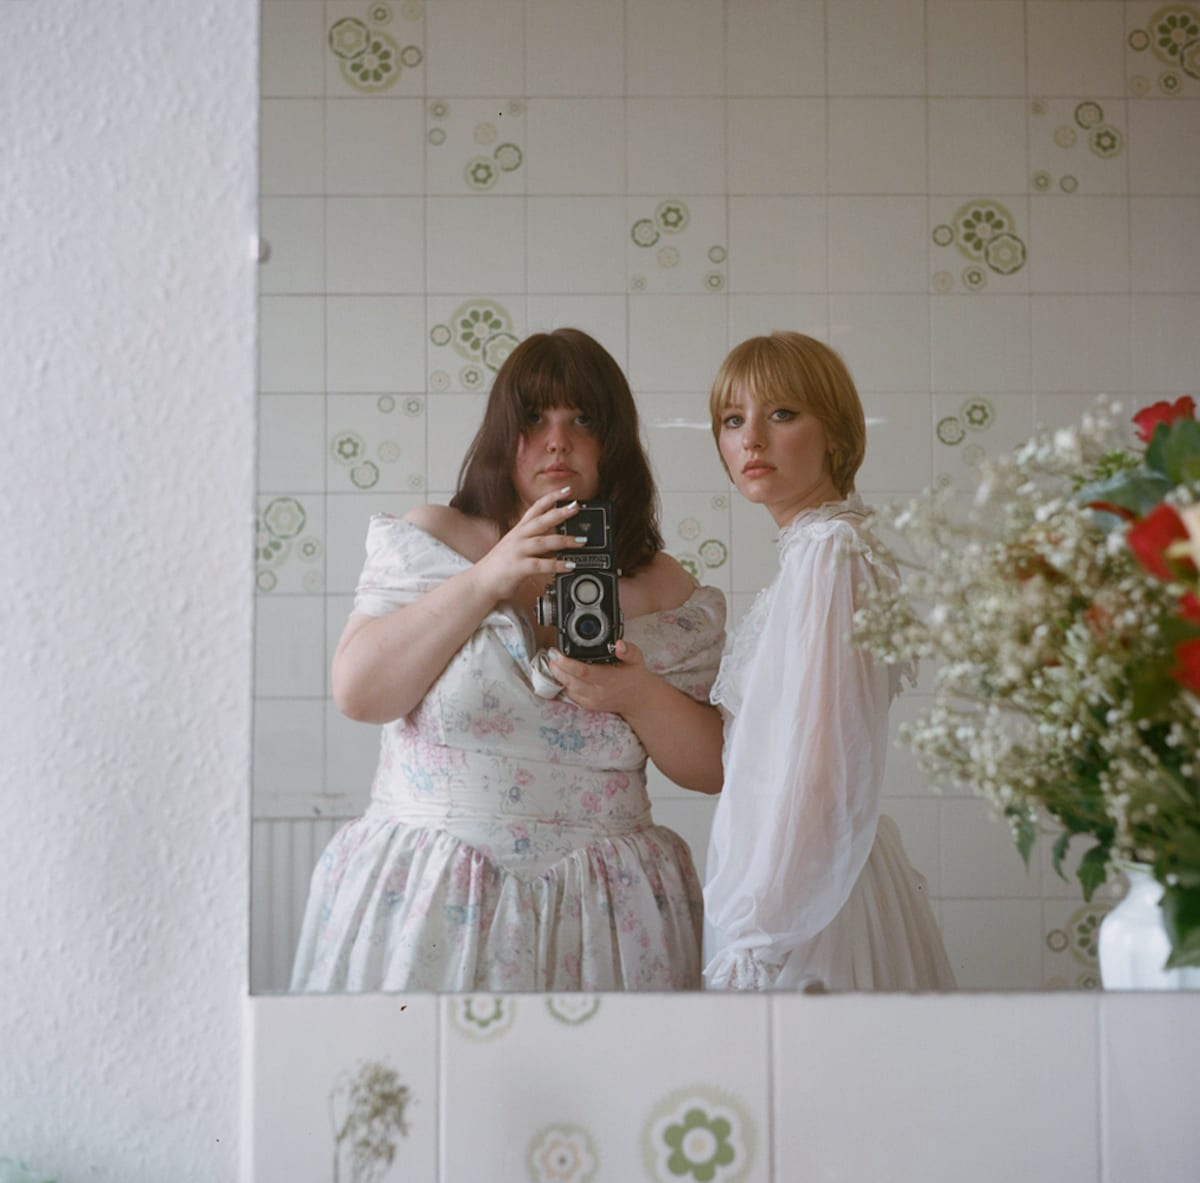 british-journal-photography-chloe-sheppard-01